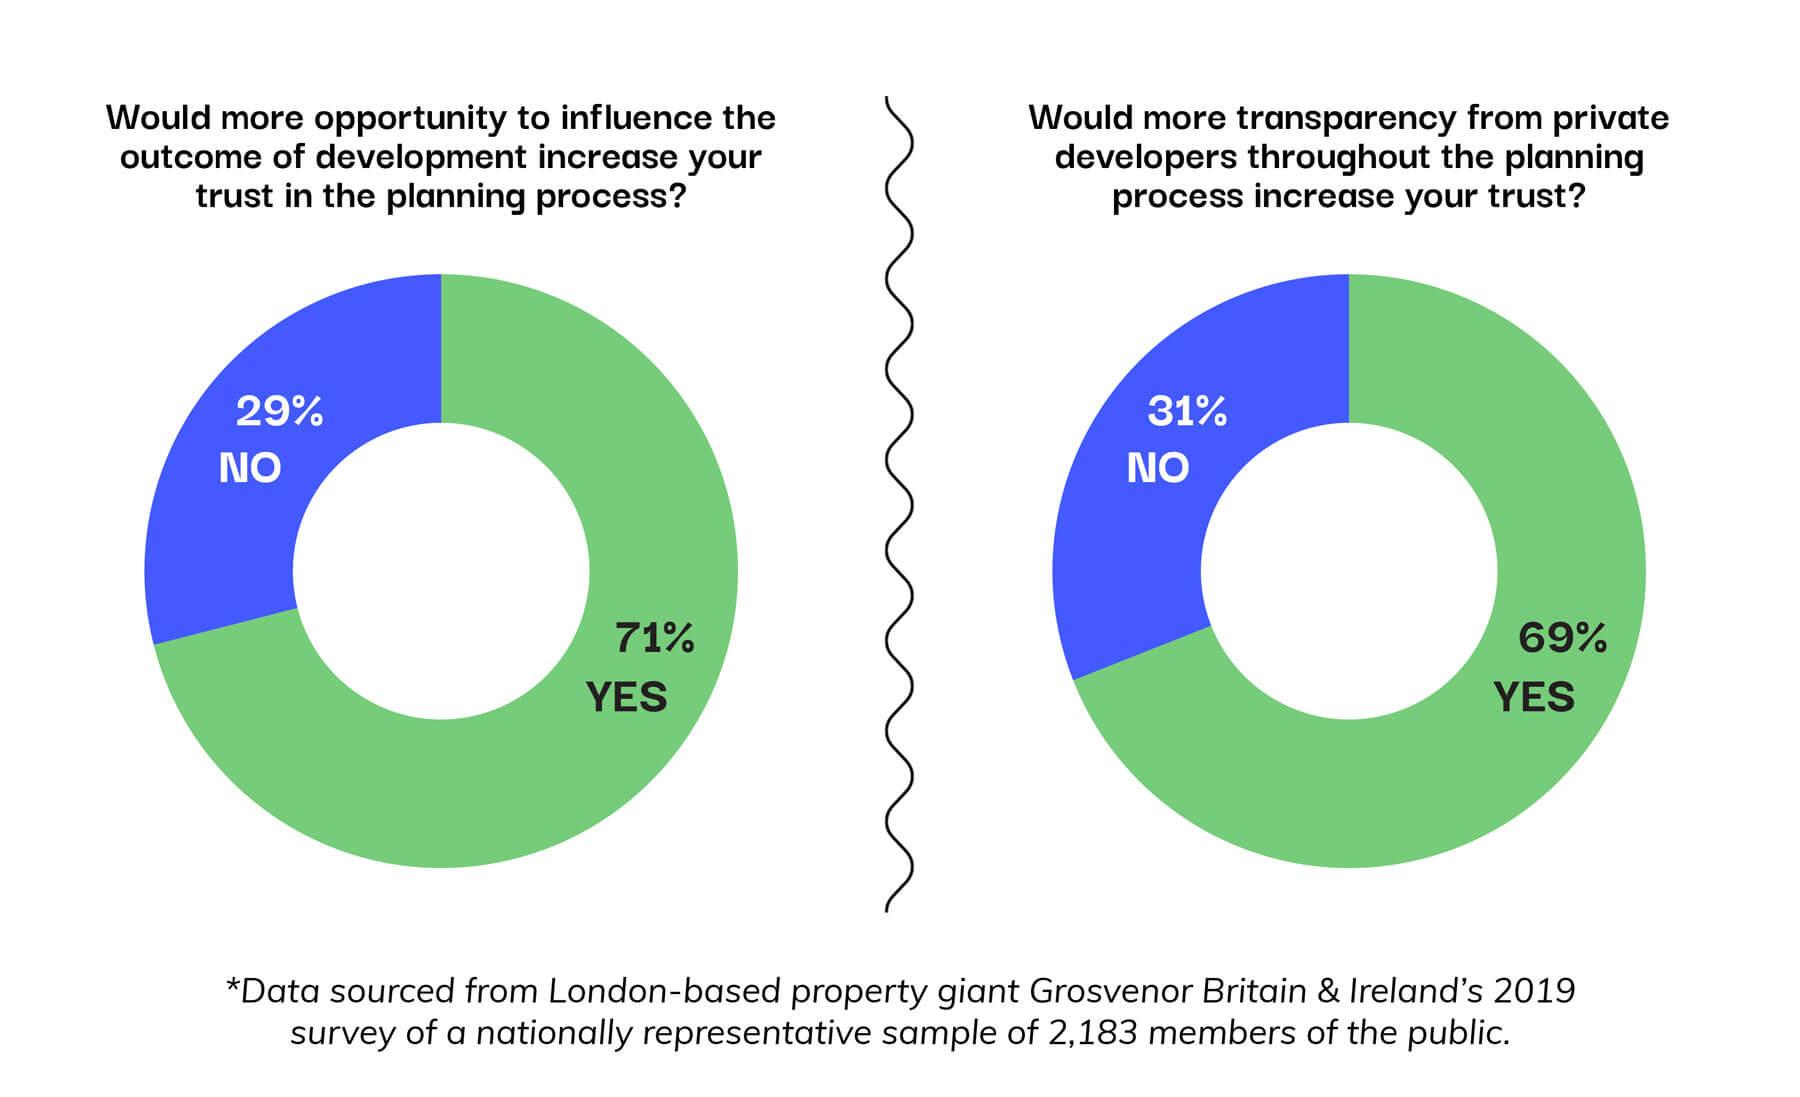 Pie charts depicting London-based property giant Grovesnor's 2019 survey